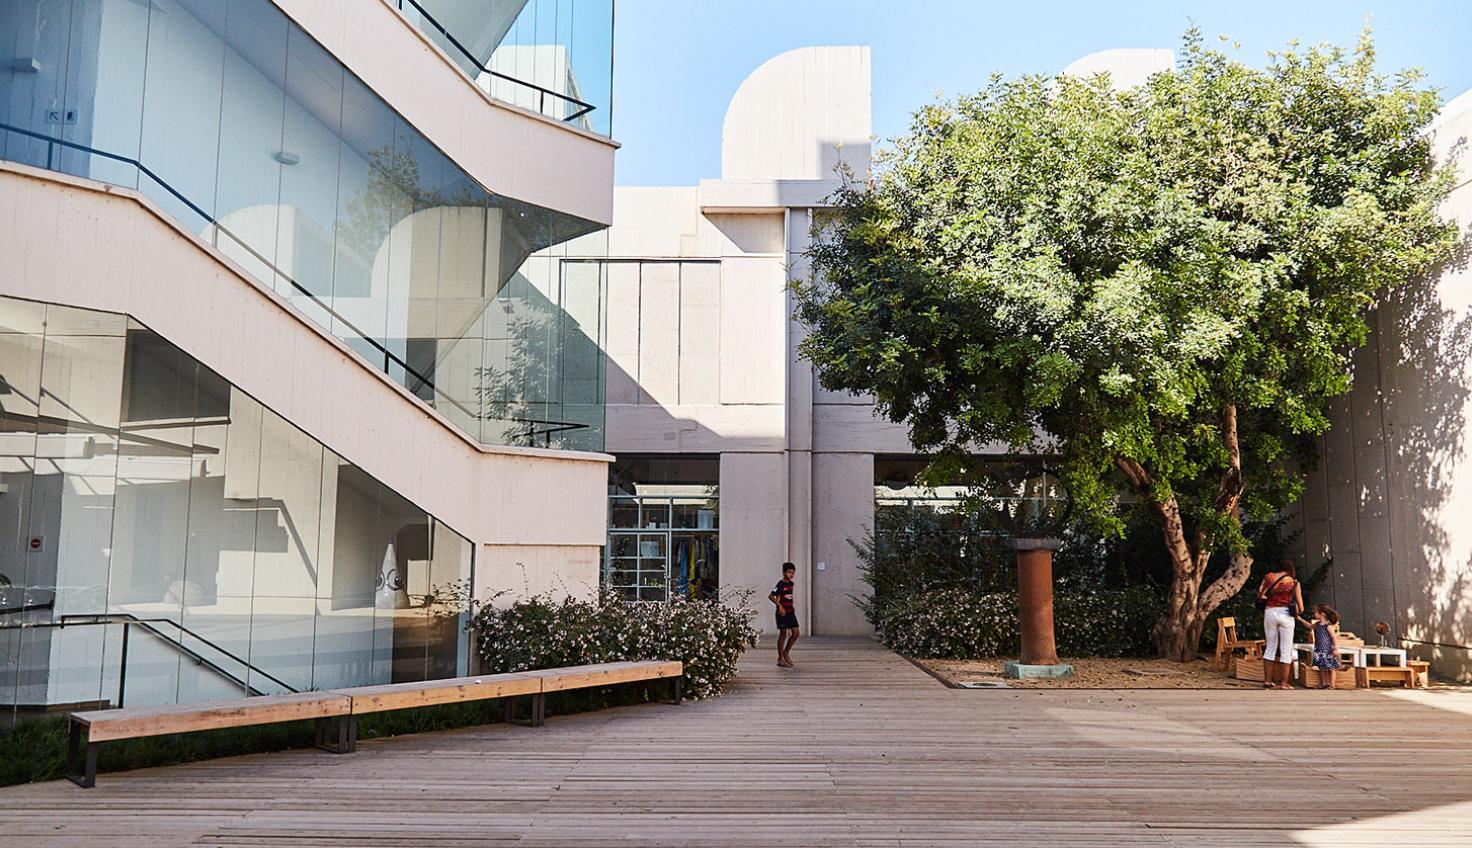 Édifice conçu par Josep Lluís Sert